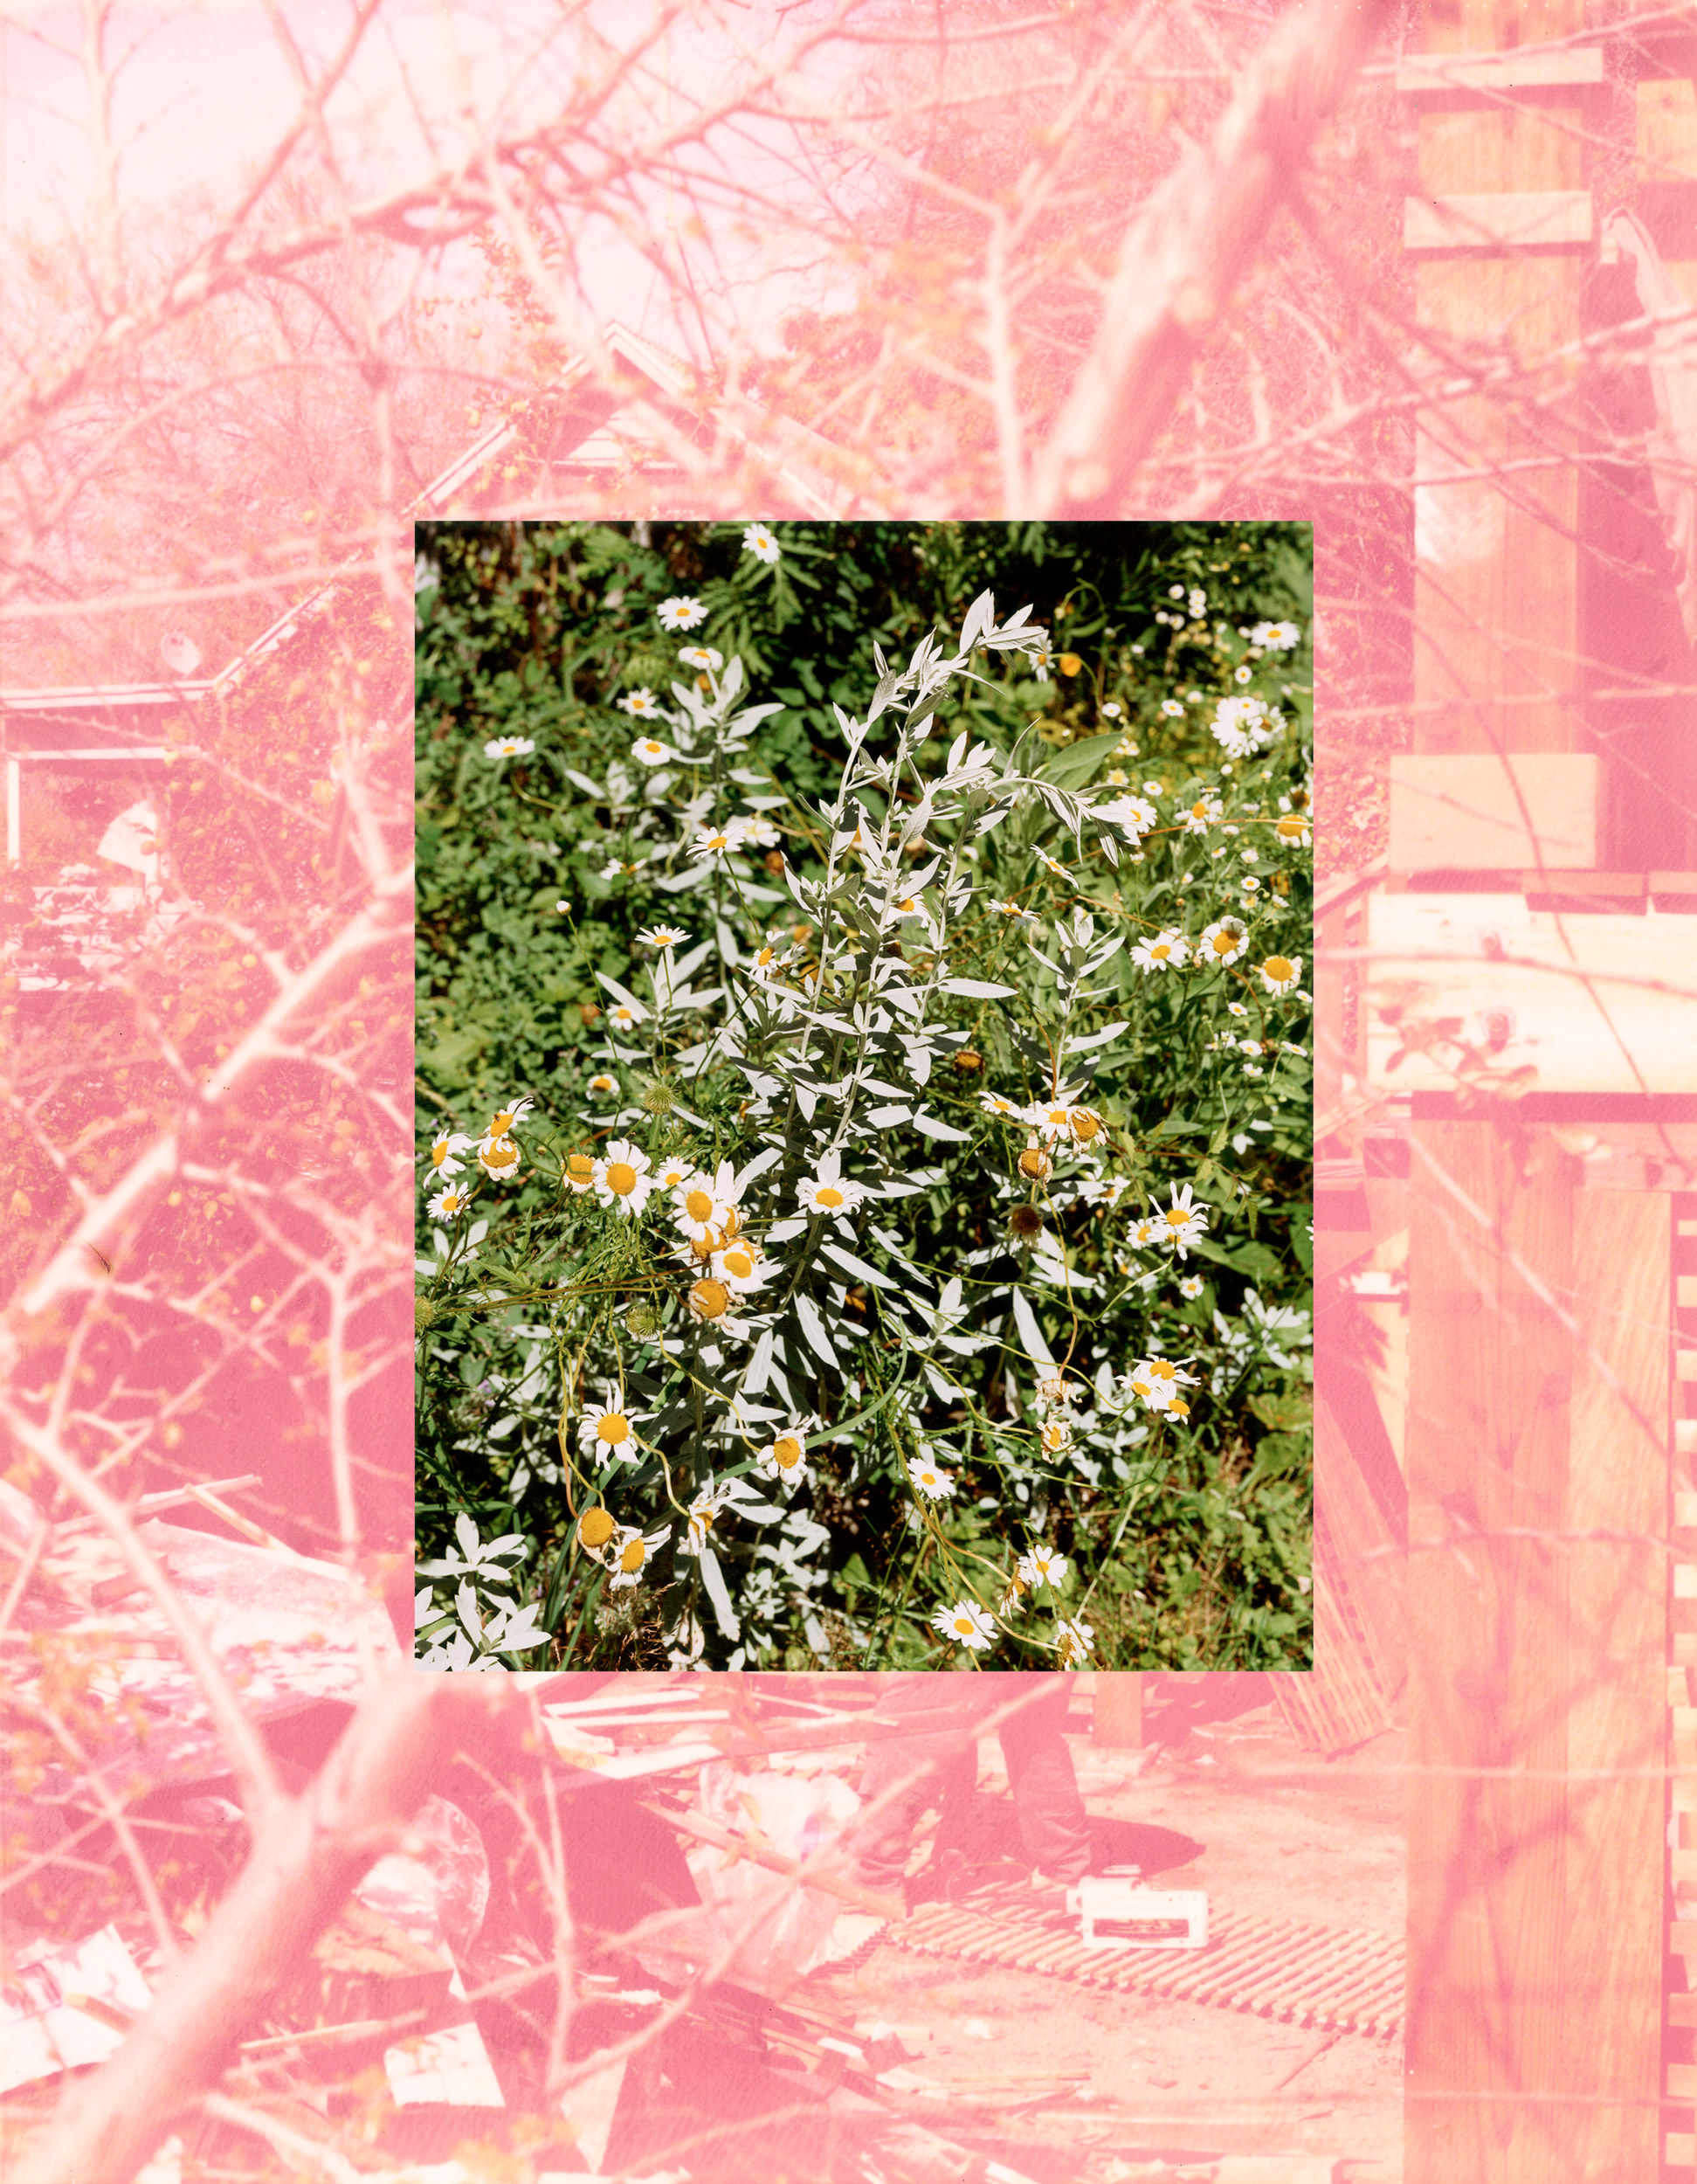 Image of Roe Ethridge, LA Backyard with Sage and Daisies, 2007